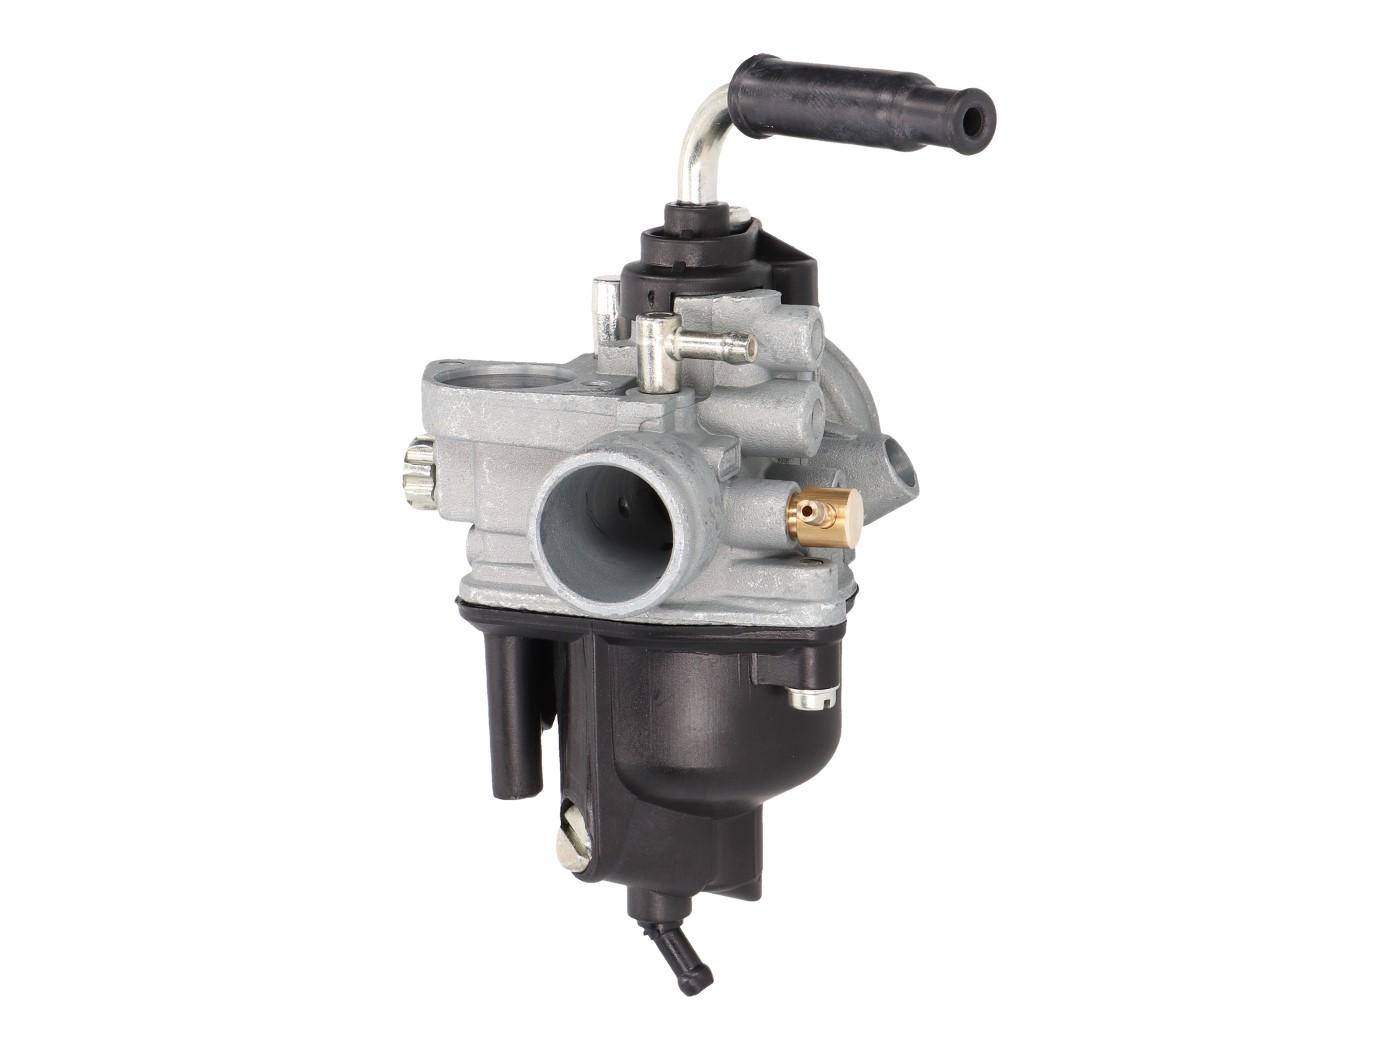 Jog R Yamaha Aerox Carburateur 16/mm standard avec Choke pour Vento Zip 50/cc Breeze Axis NG BWS